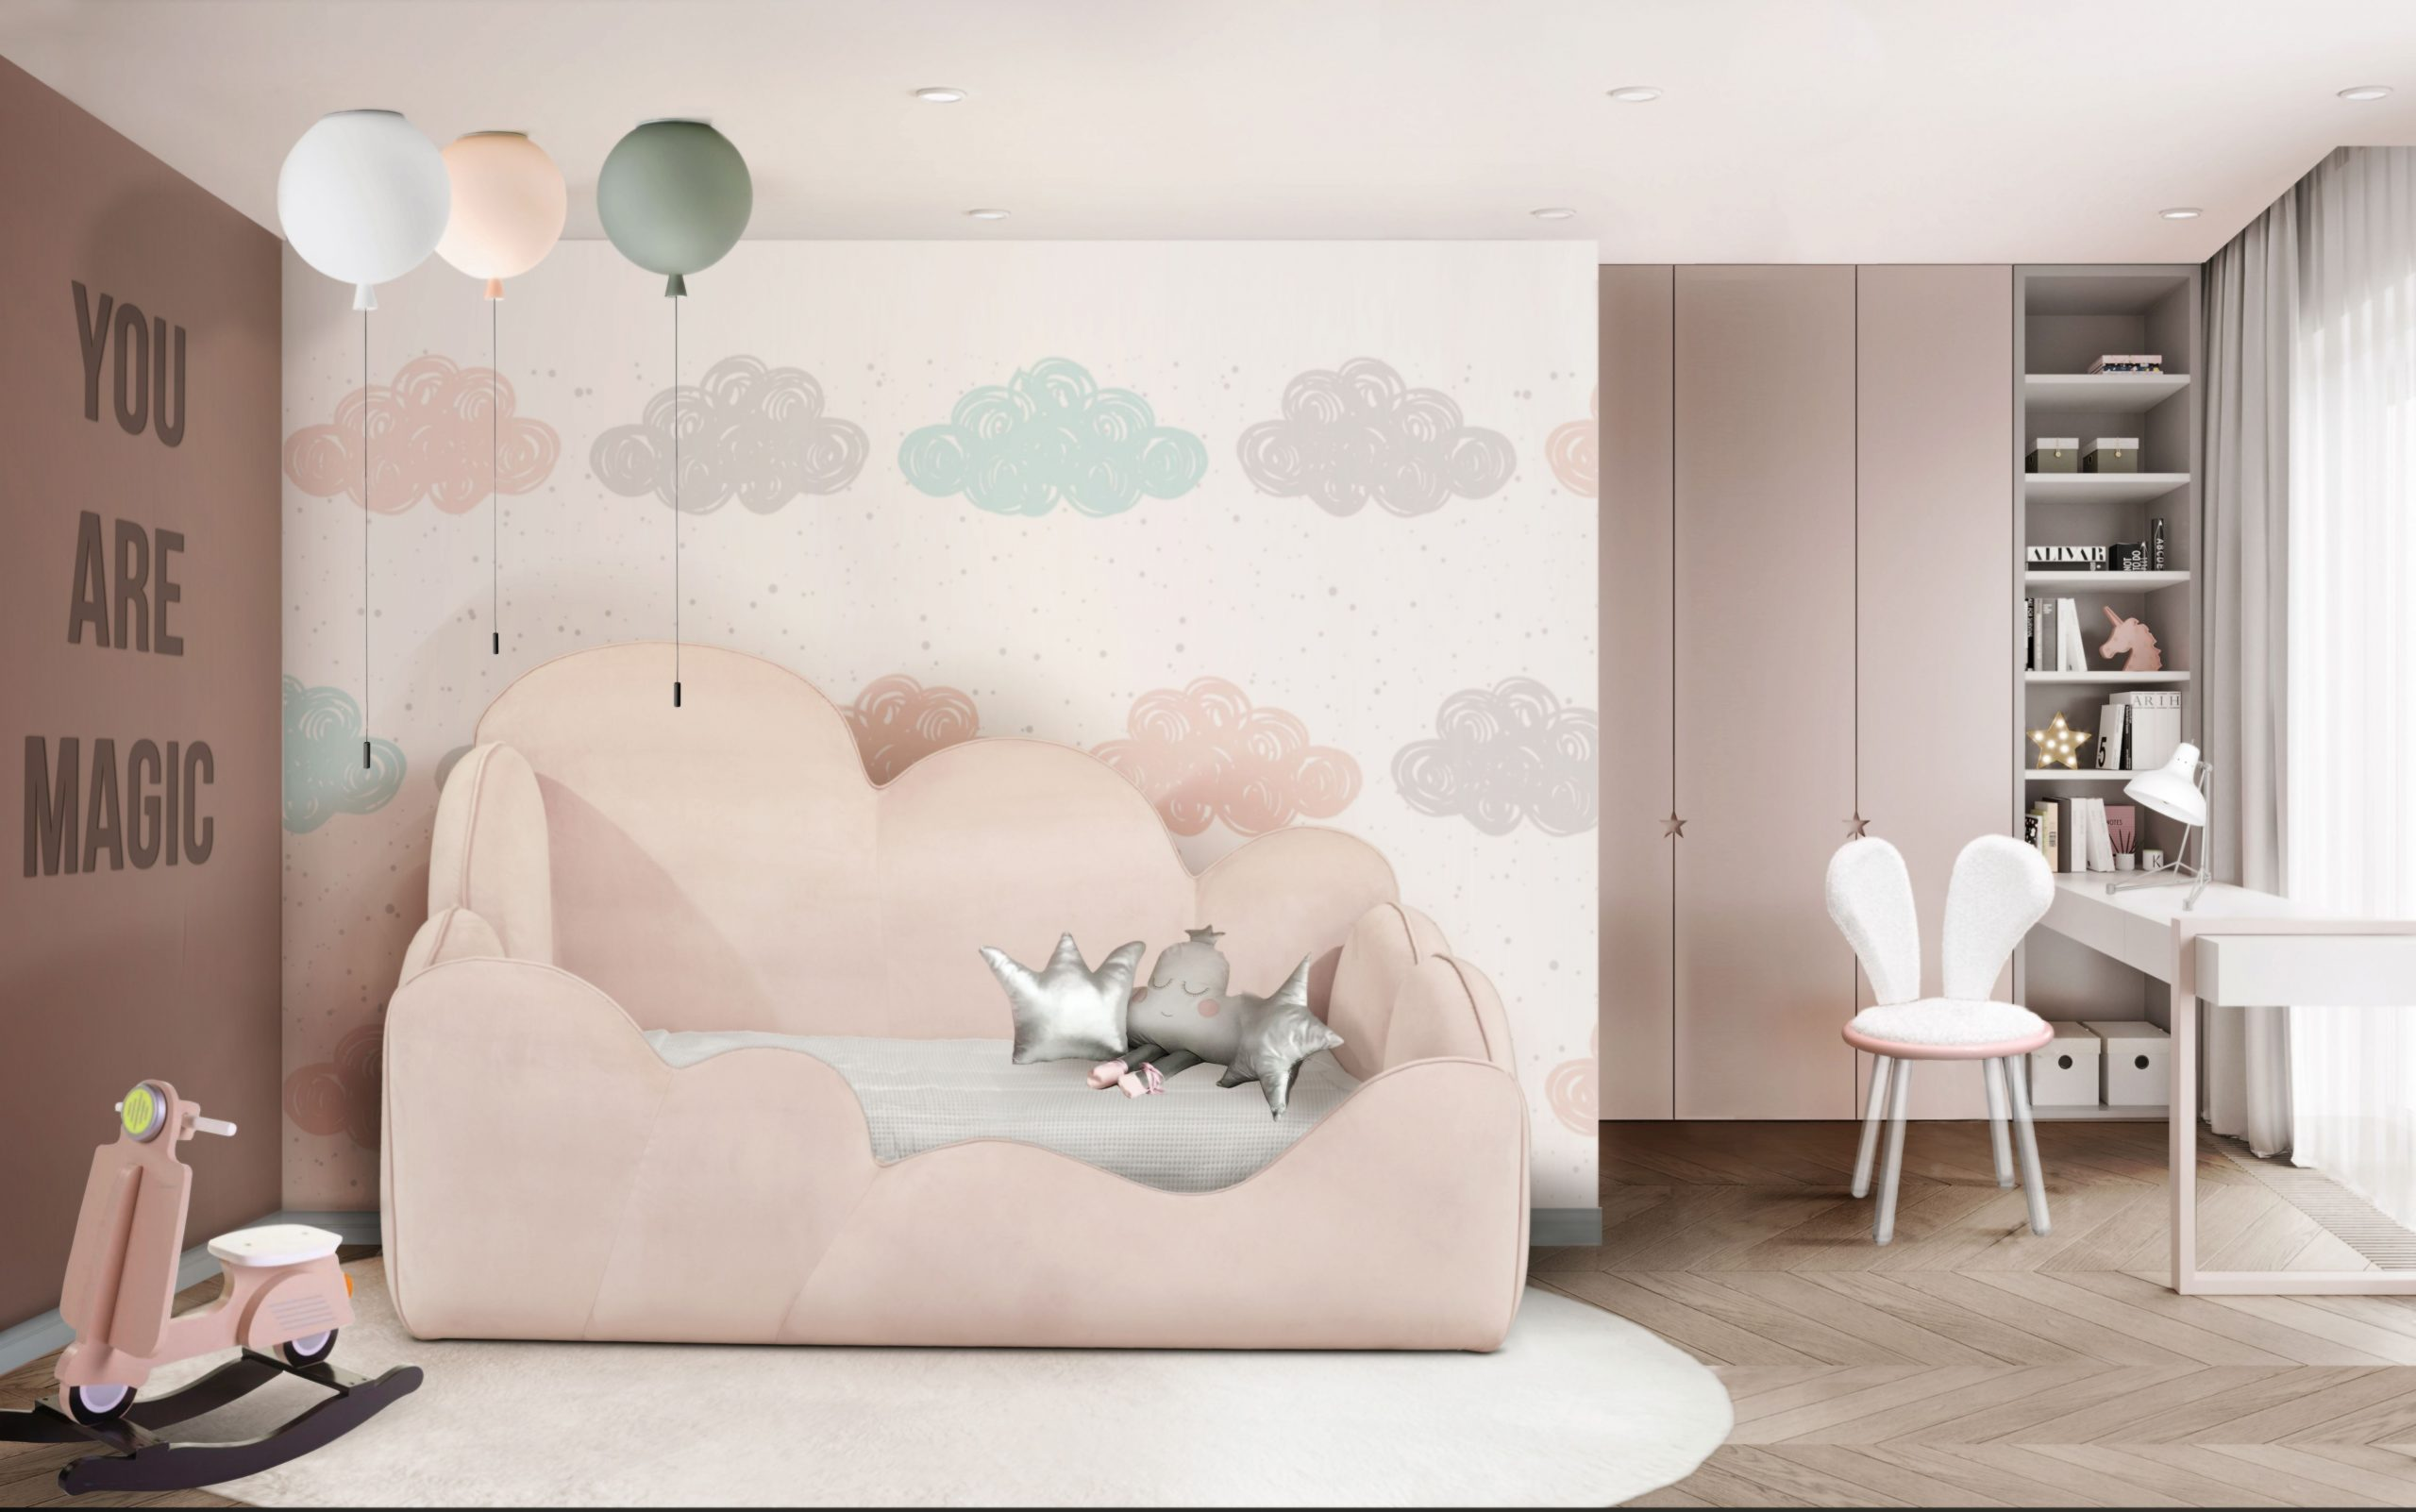 Kid's Bedroom Ideas, modern bedroom for kids, modern kid's bedroom design, kids bedroom home inspiration ideas